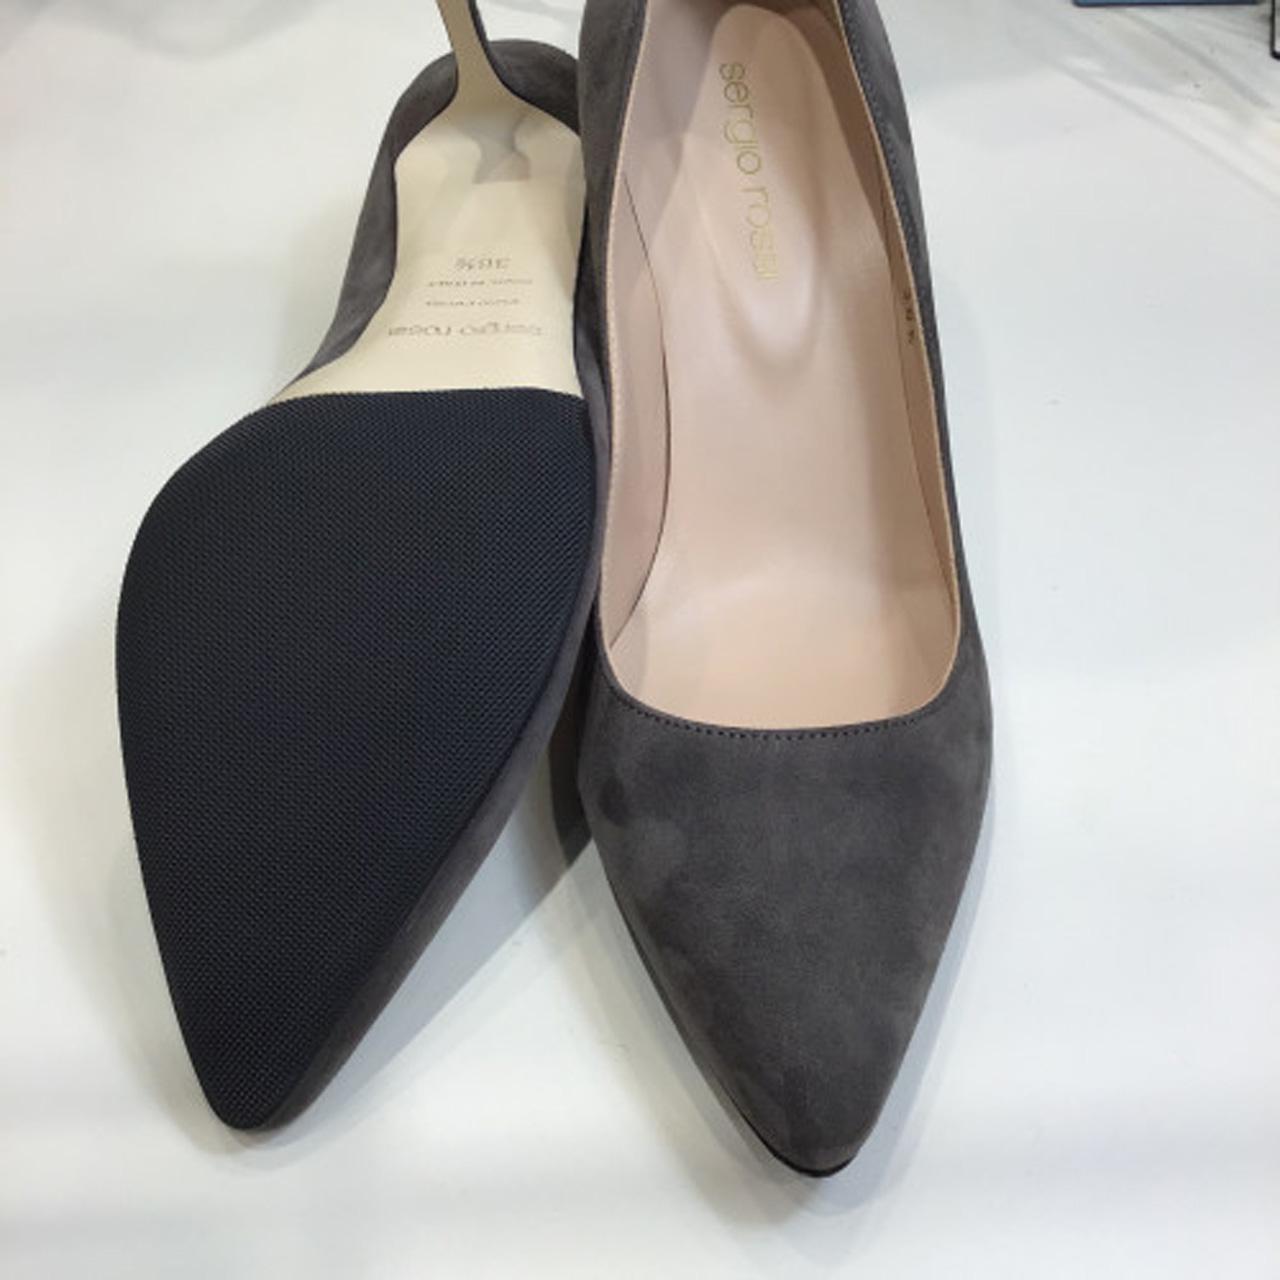 靴修理婦人ソール